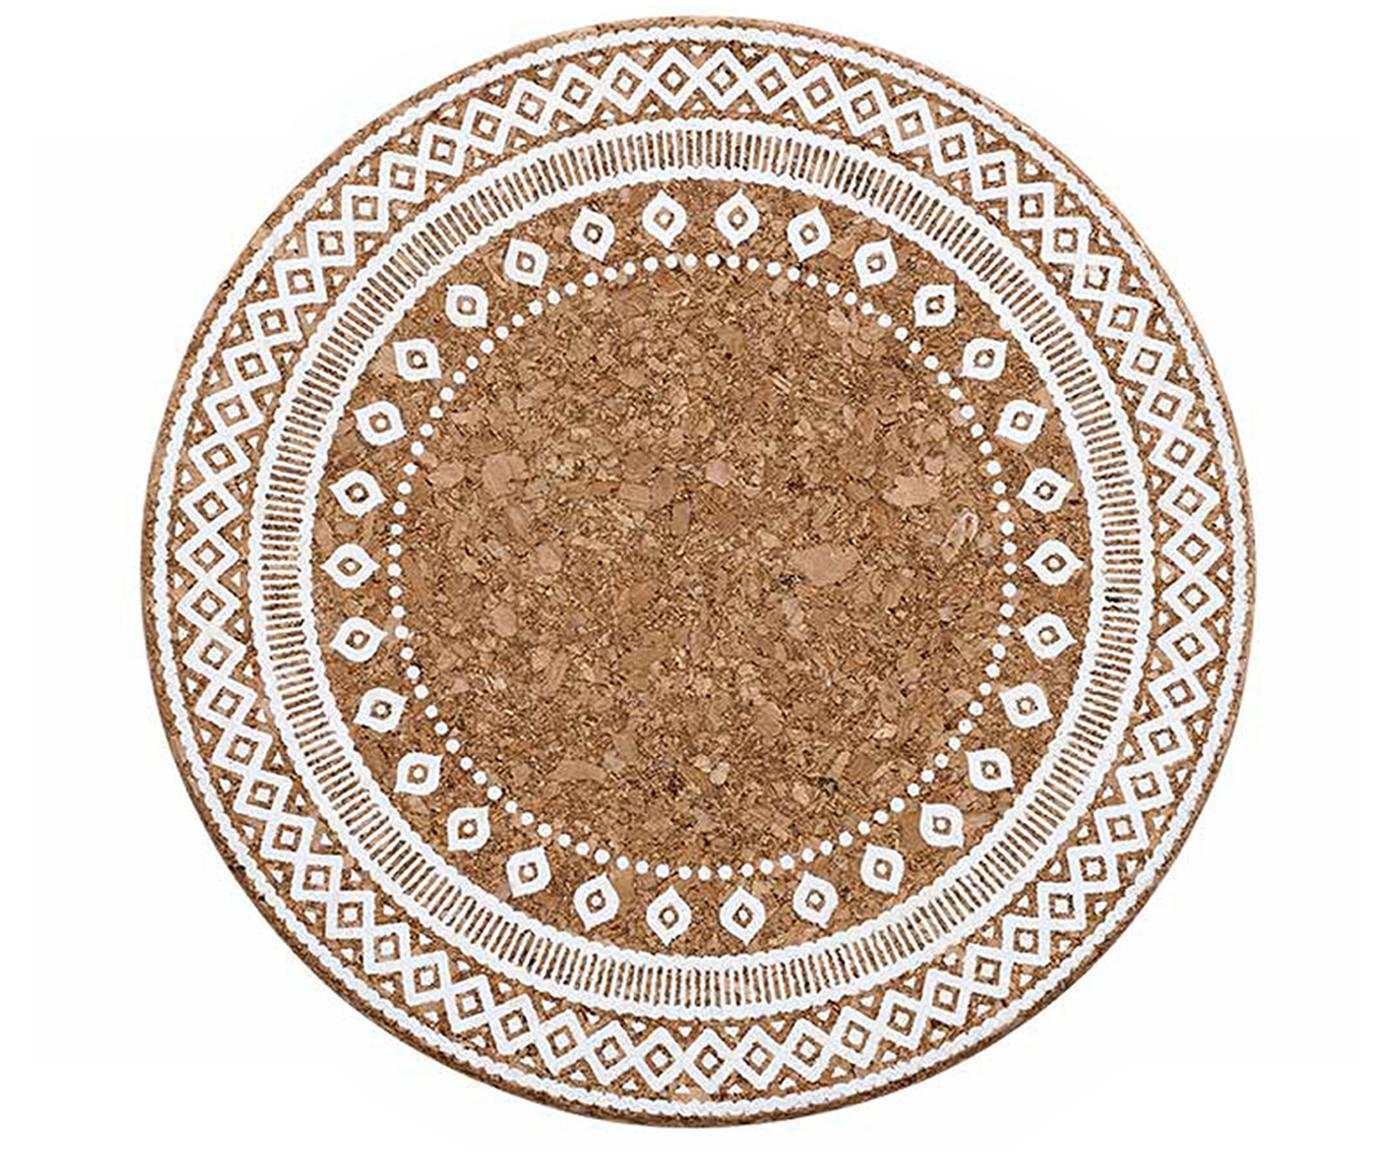 Sottopentola Oasis, 2 pz., Sughero, Bianco, sughero, Ø 20 x Alt. 2 cm